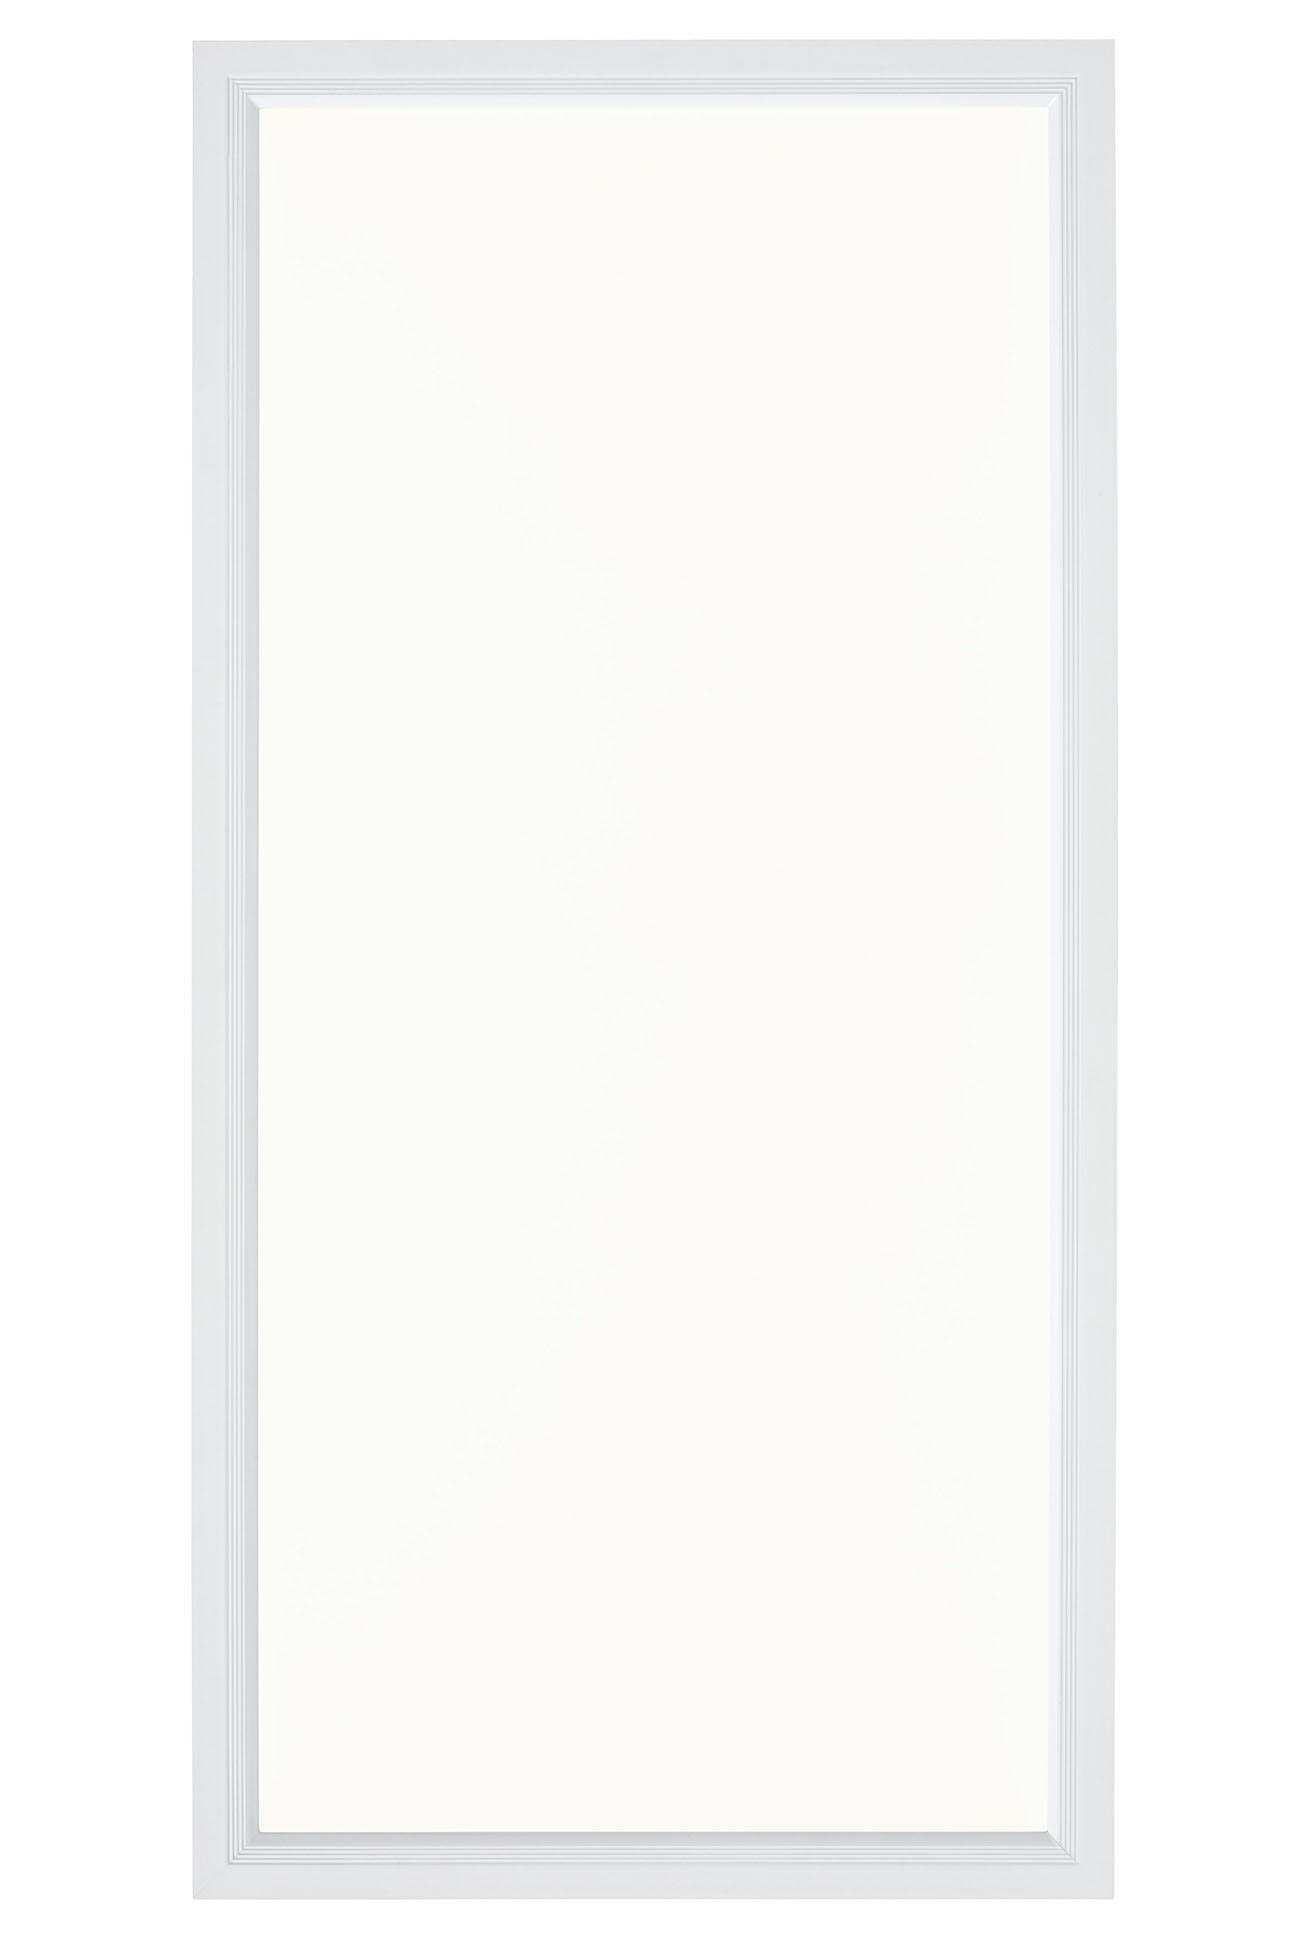 TELEFUNKEN CCT LED Panel, 59,5 cm, 36 W, Weiss